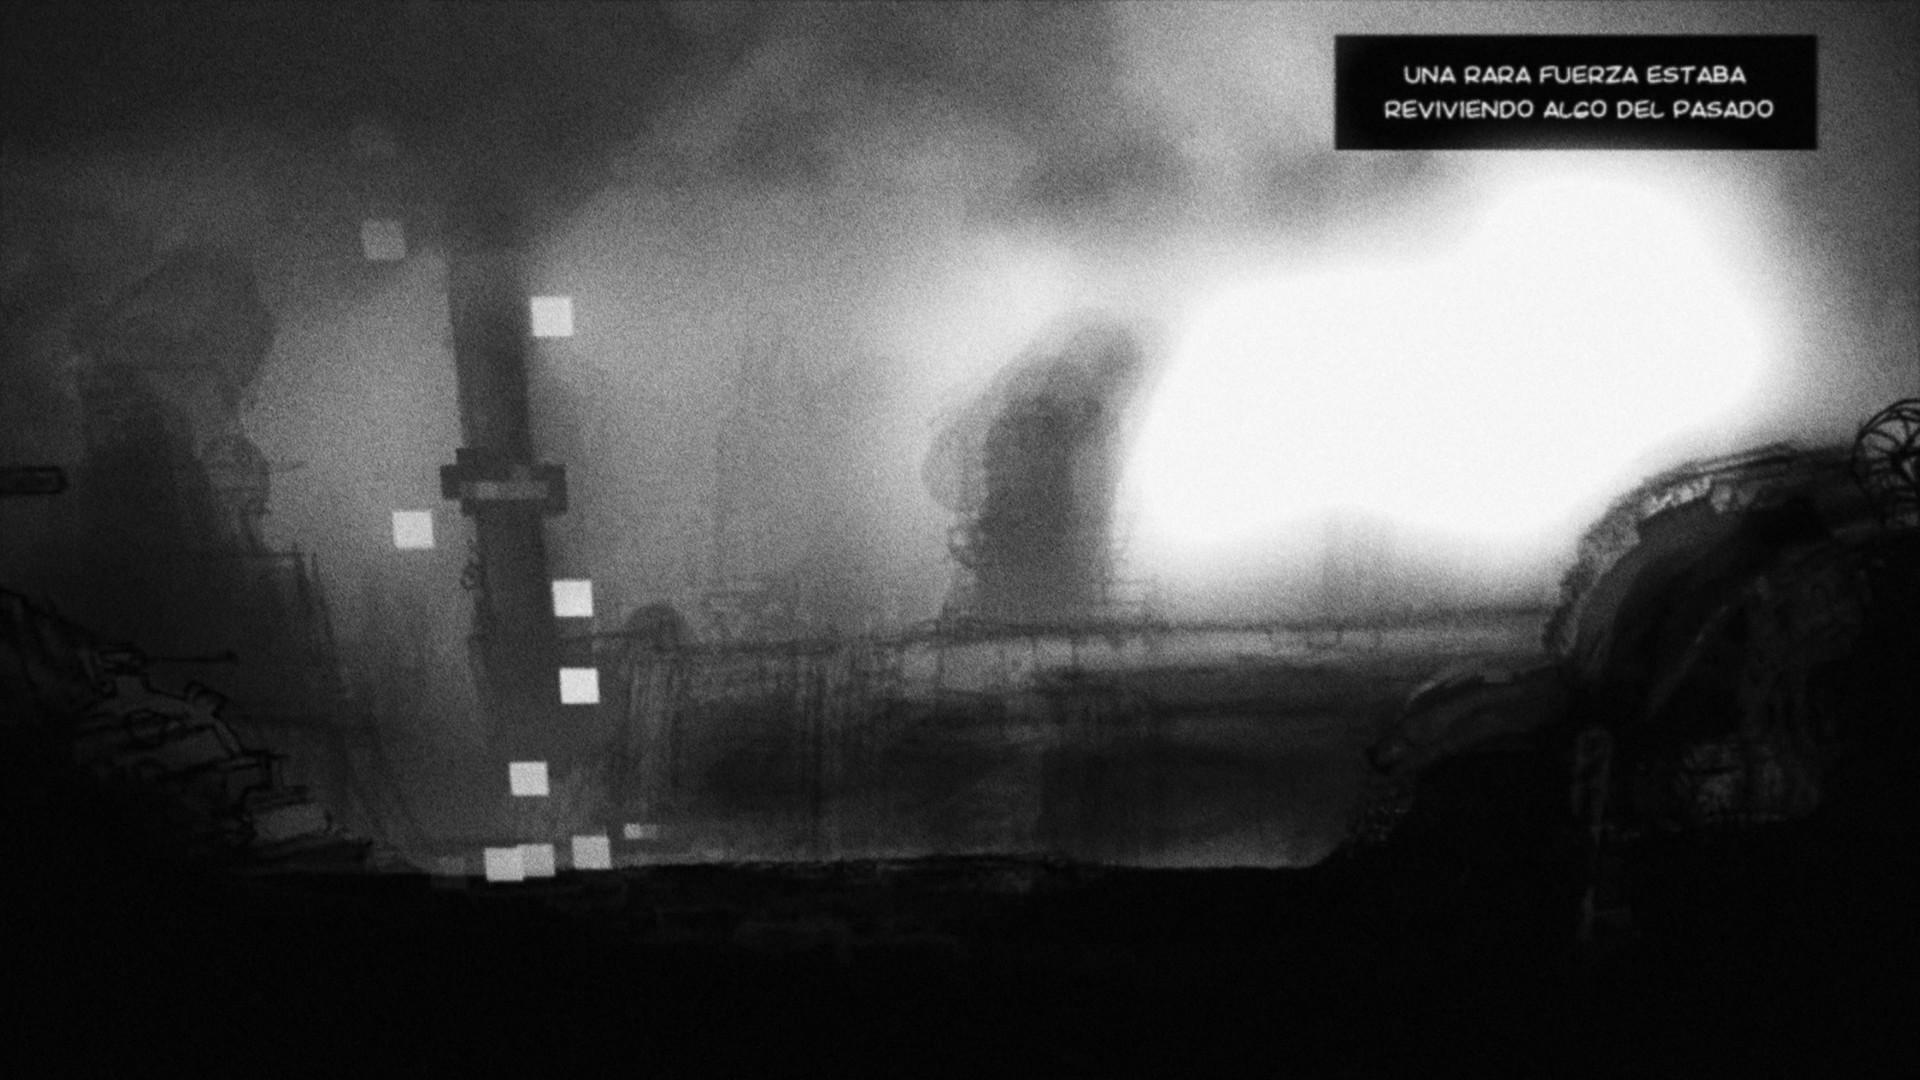 Dorian rodriguez animacion oldyssey ganador bronce proyecto multimedia 11 00 00 31 06 still009